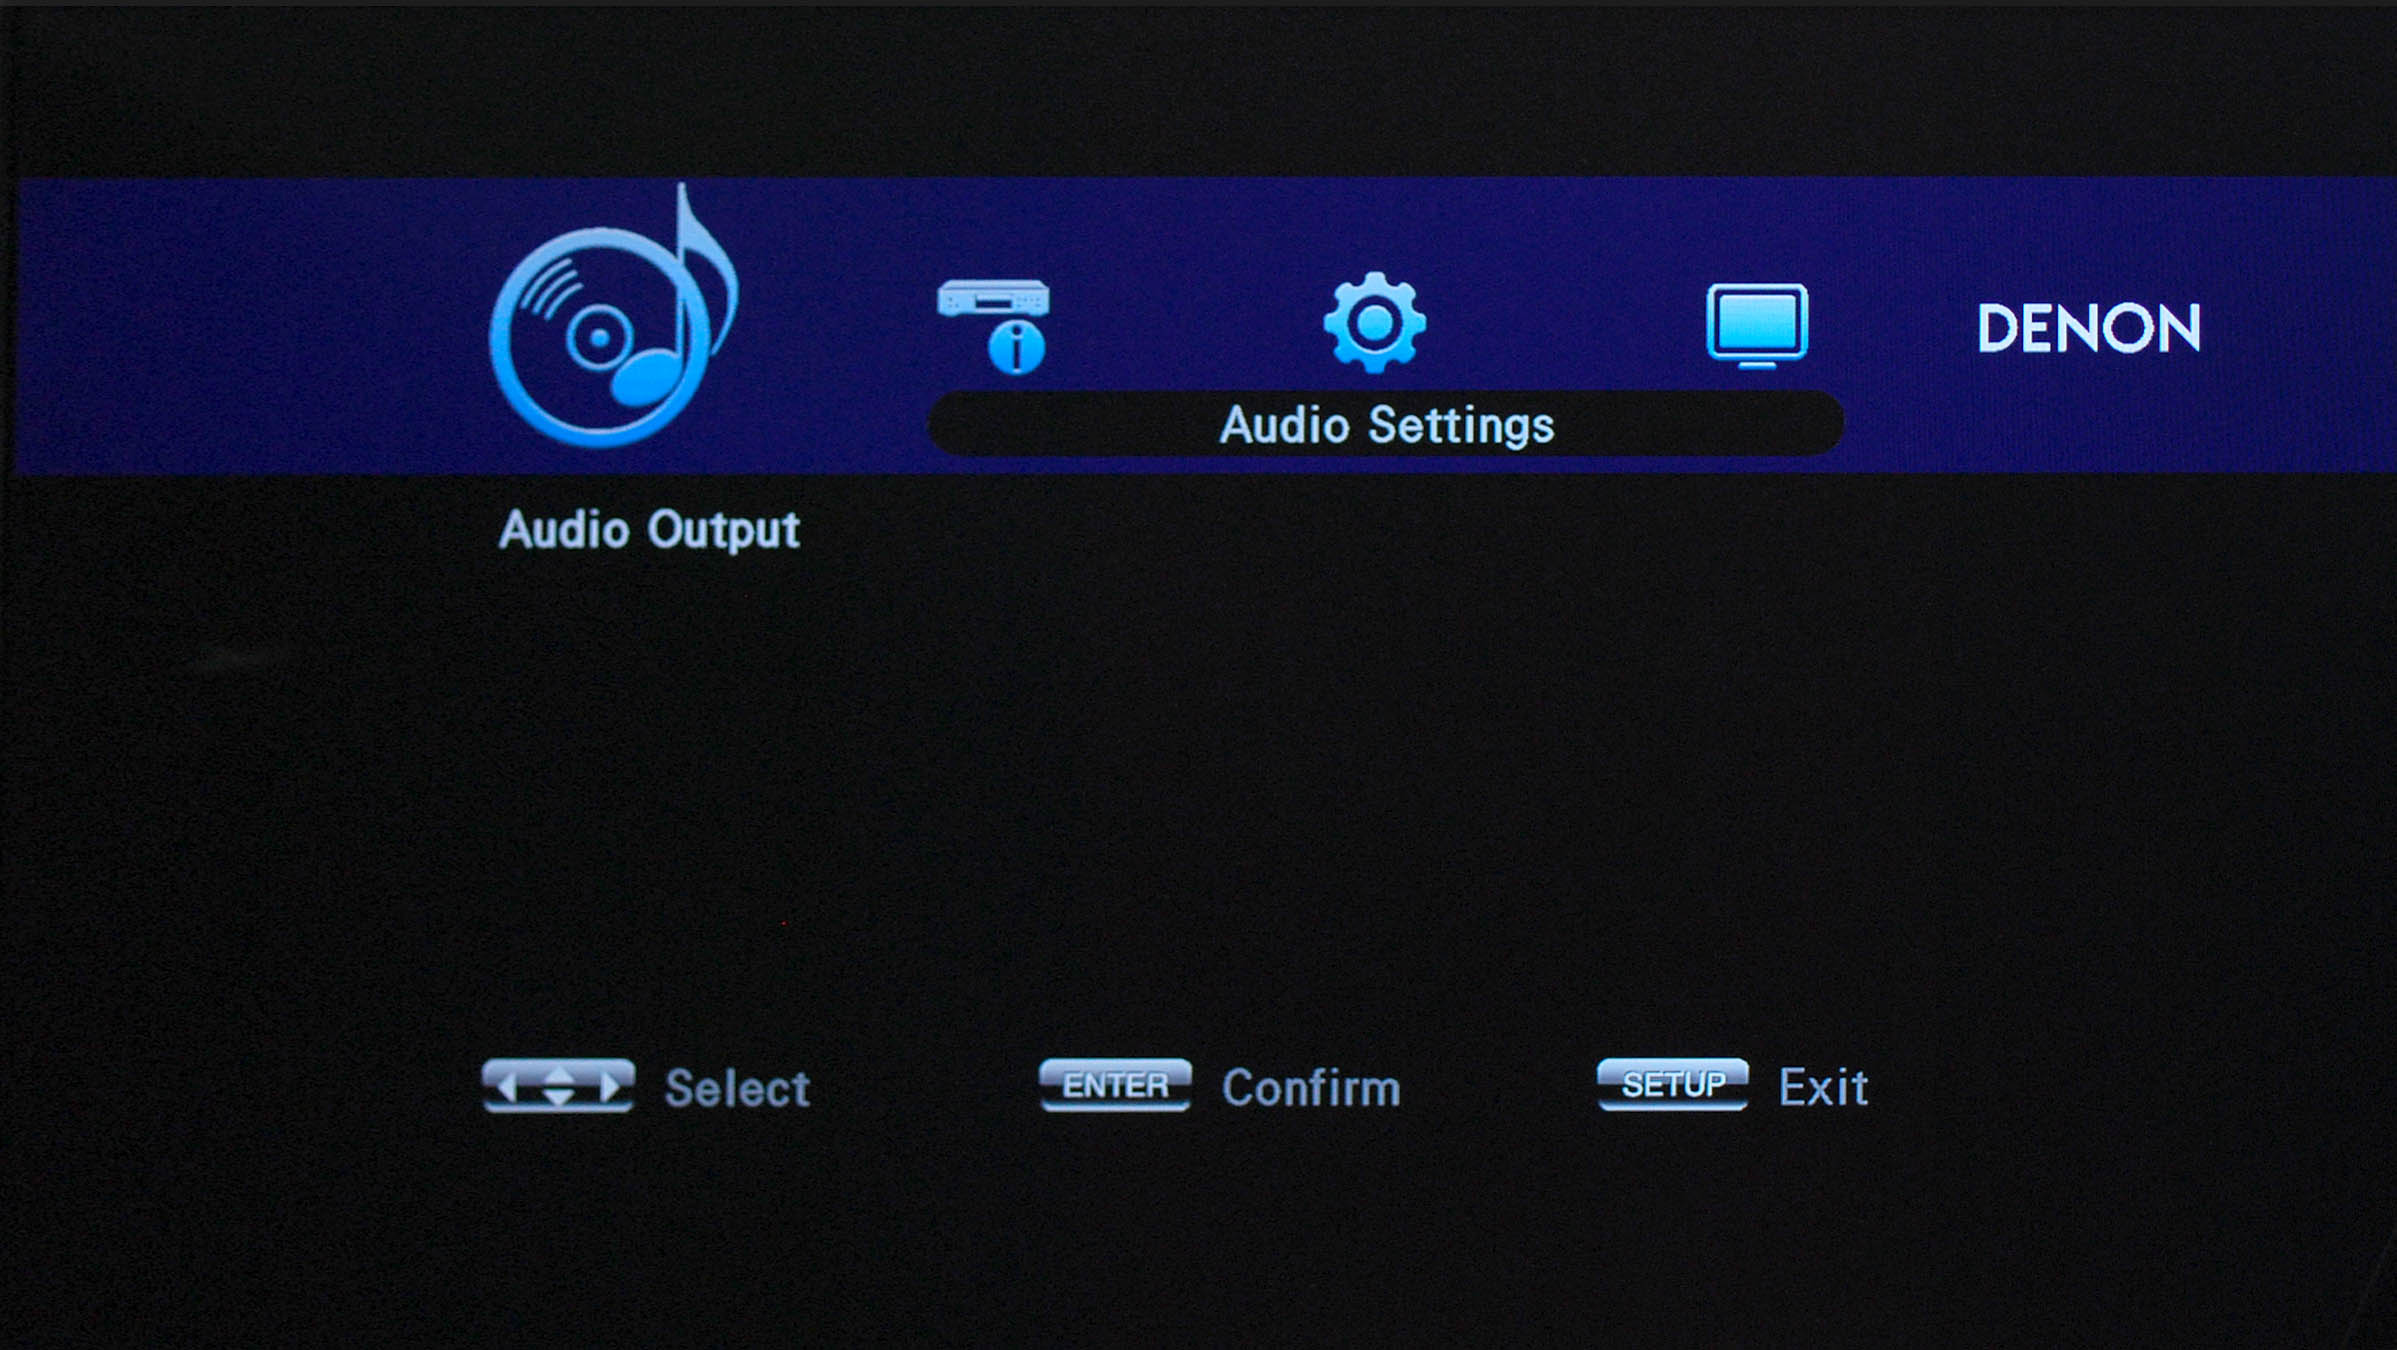 Denon DBT-1713UD GUI Screen 3